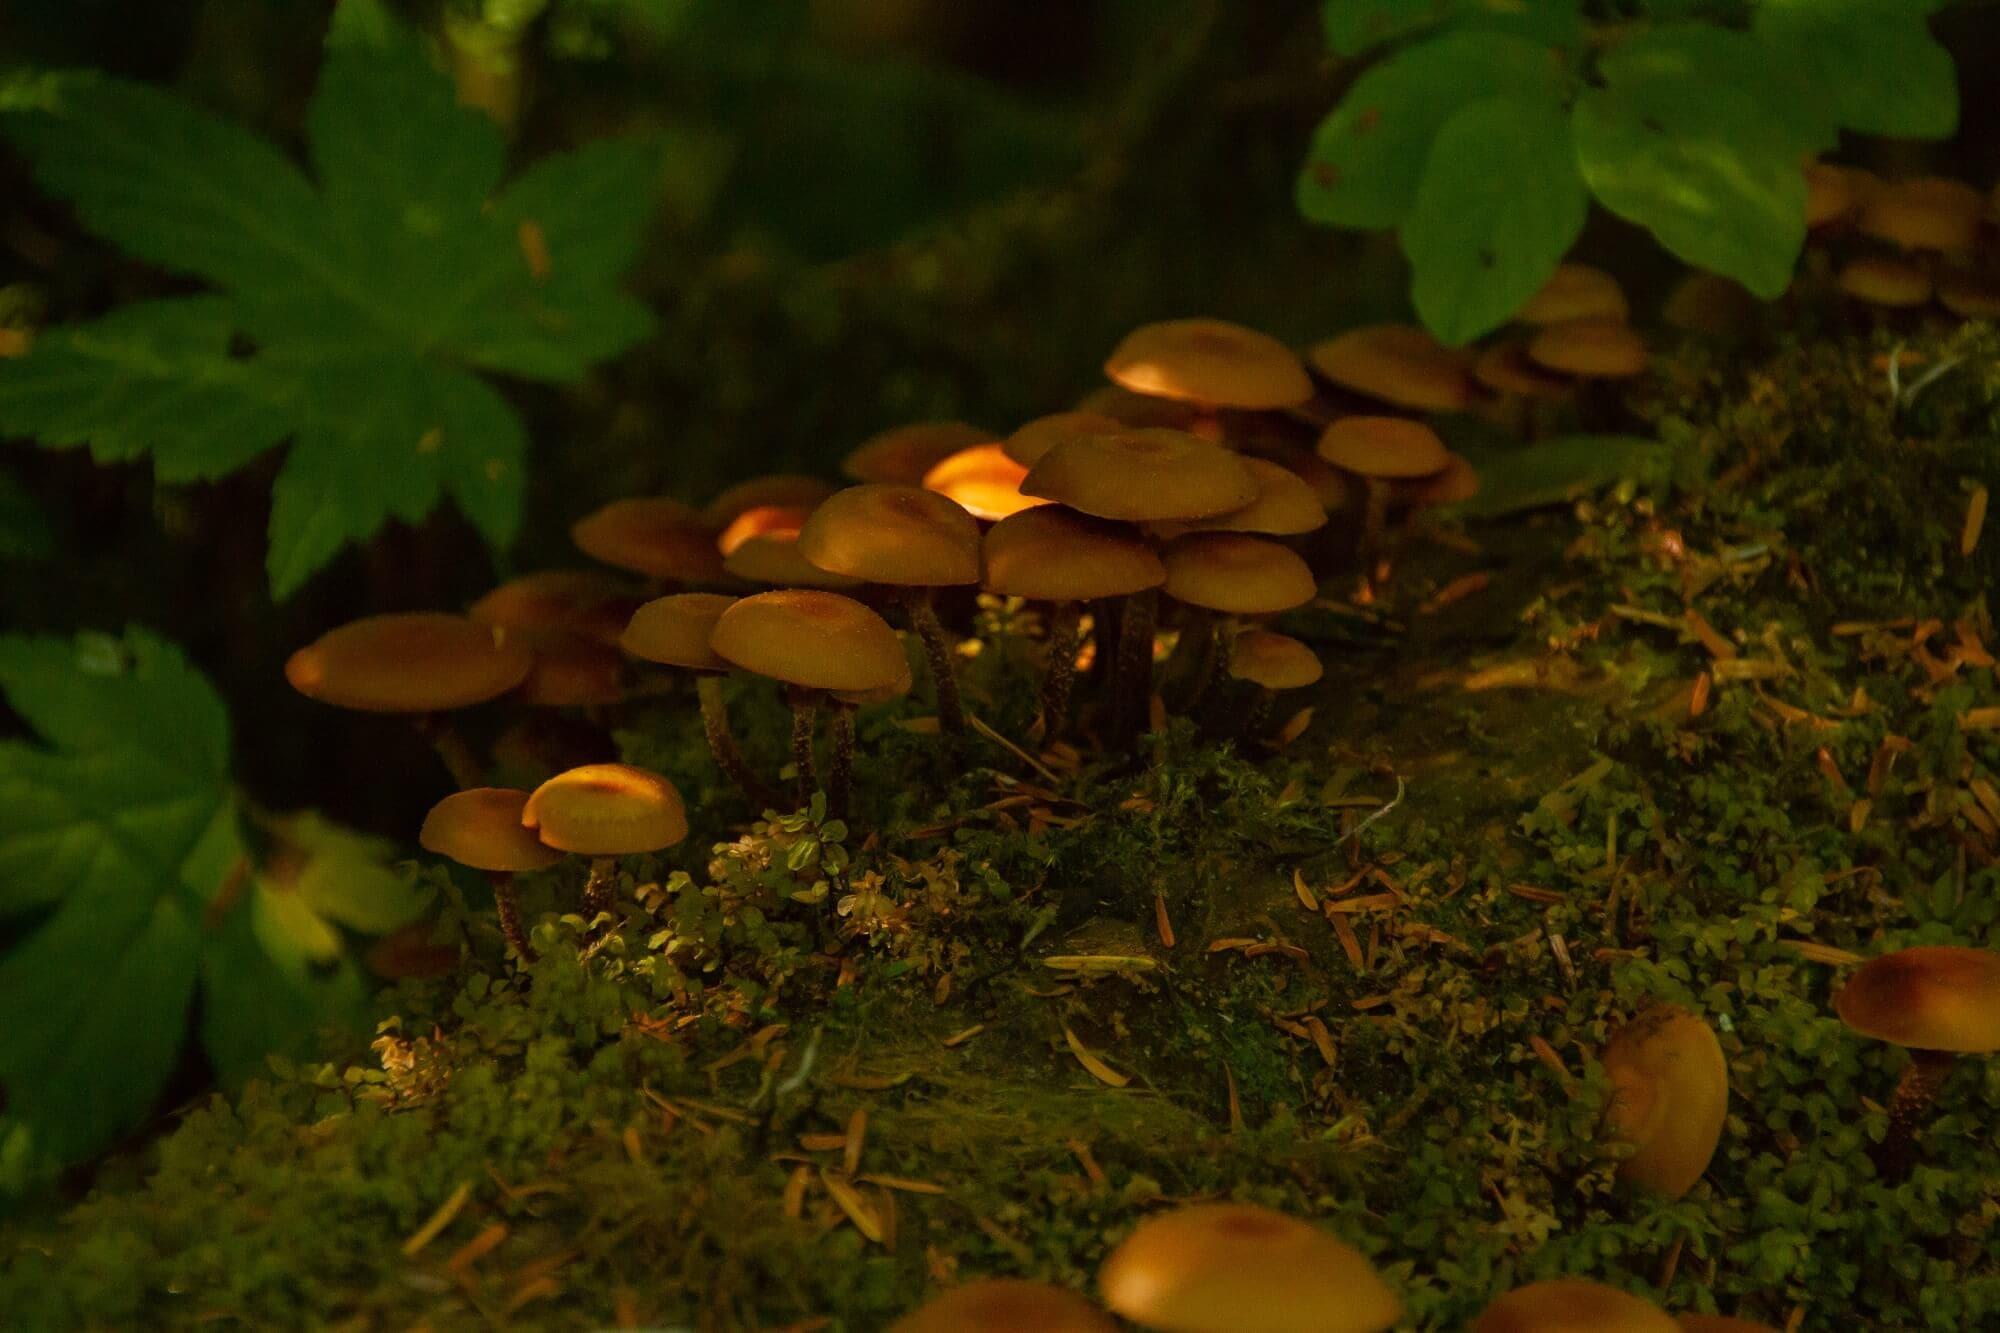 https://www.kawanti.com/wp-content/uploads/2018/10/ARS-Fungi.jpg